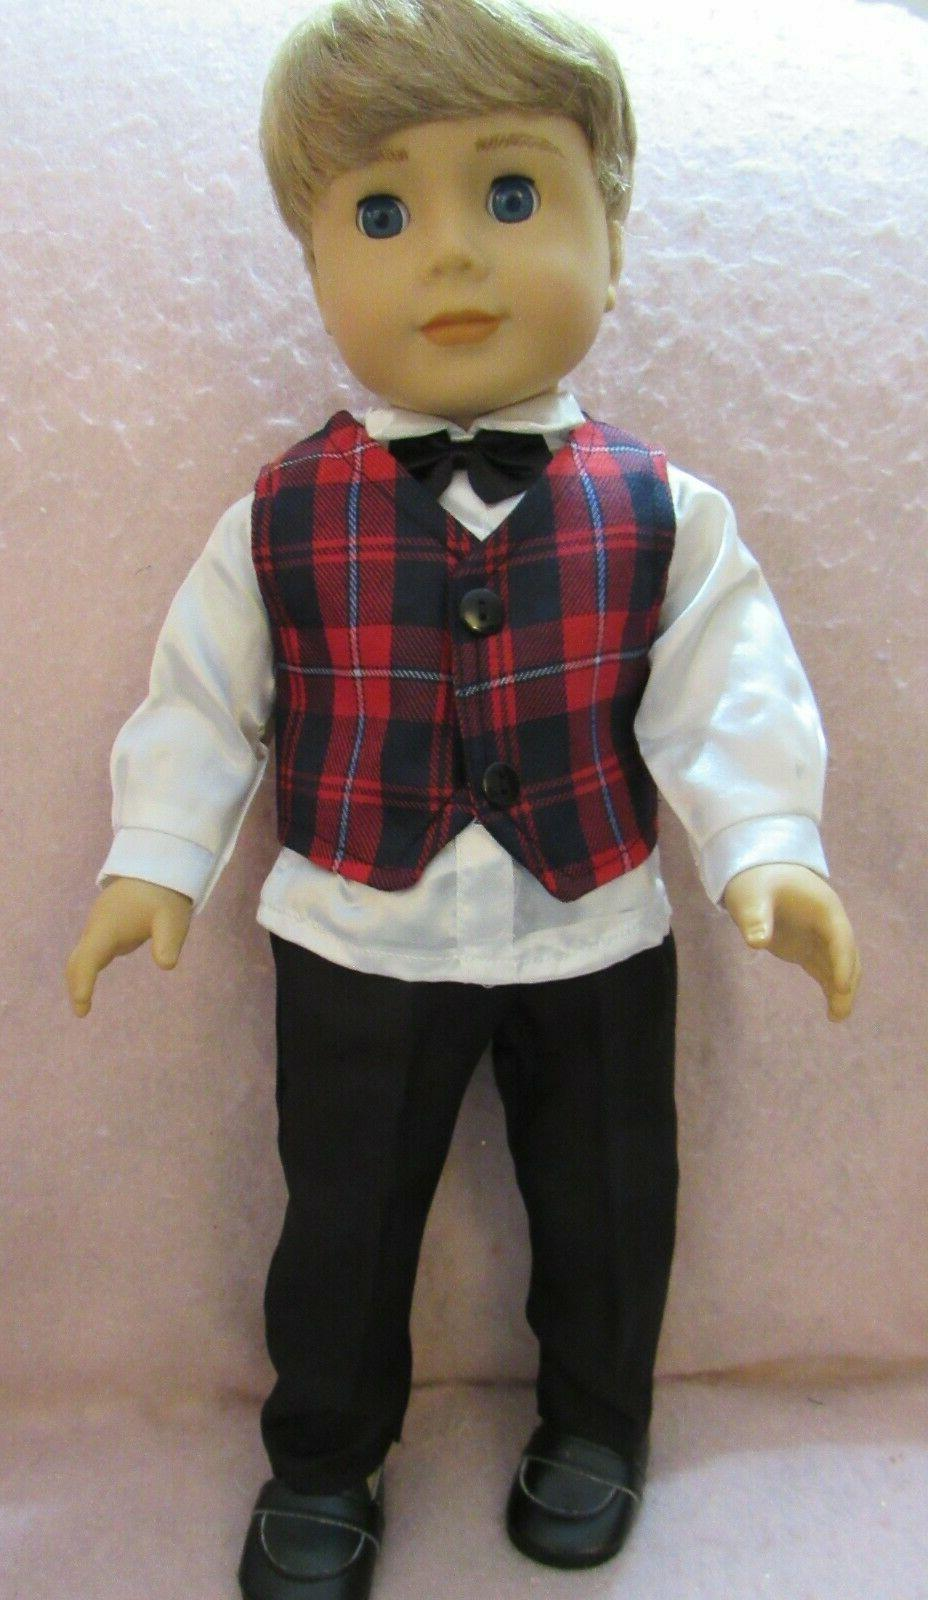 plaid vest set fits american boy doll